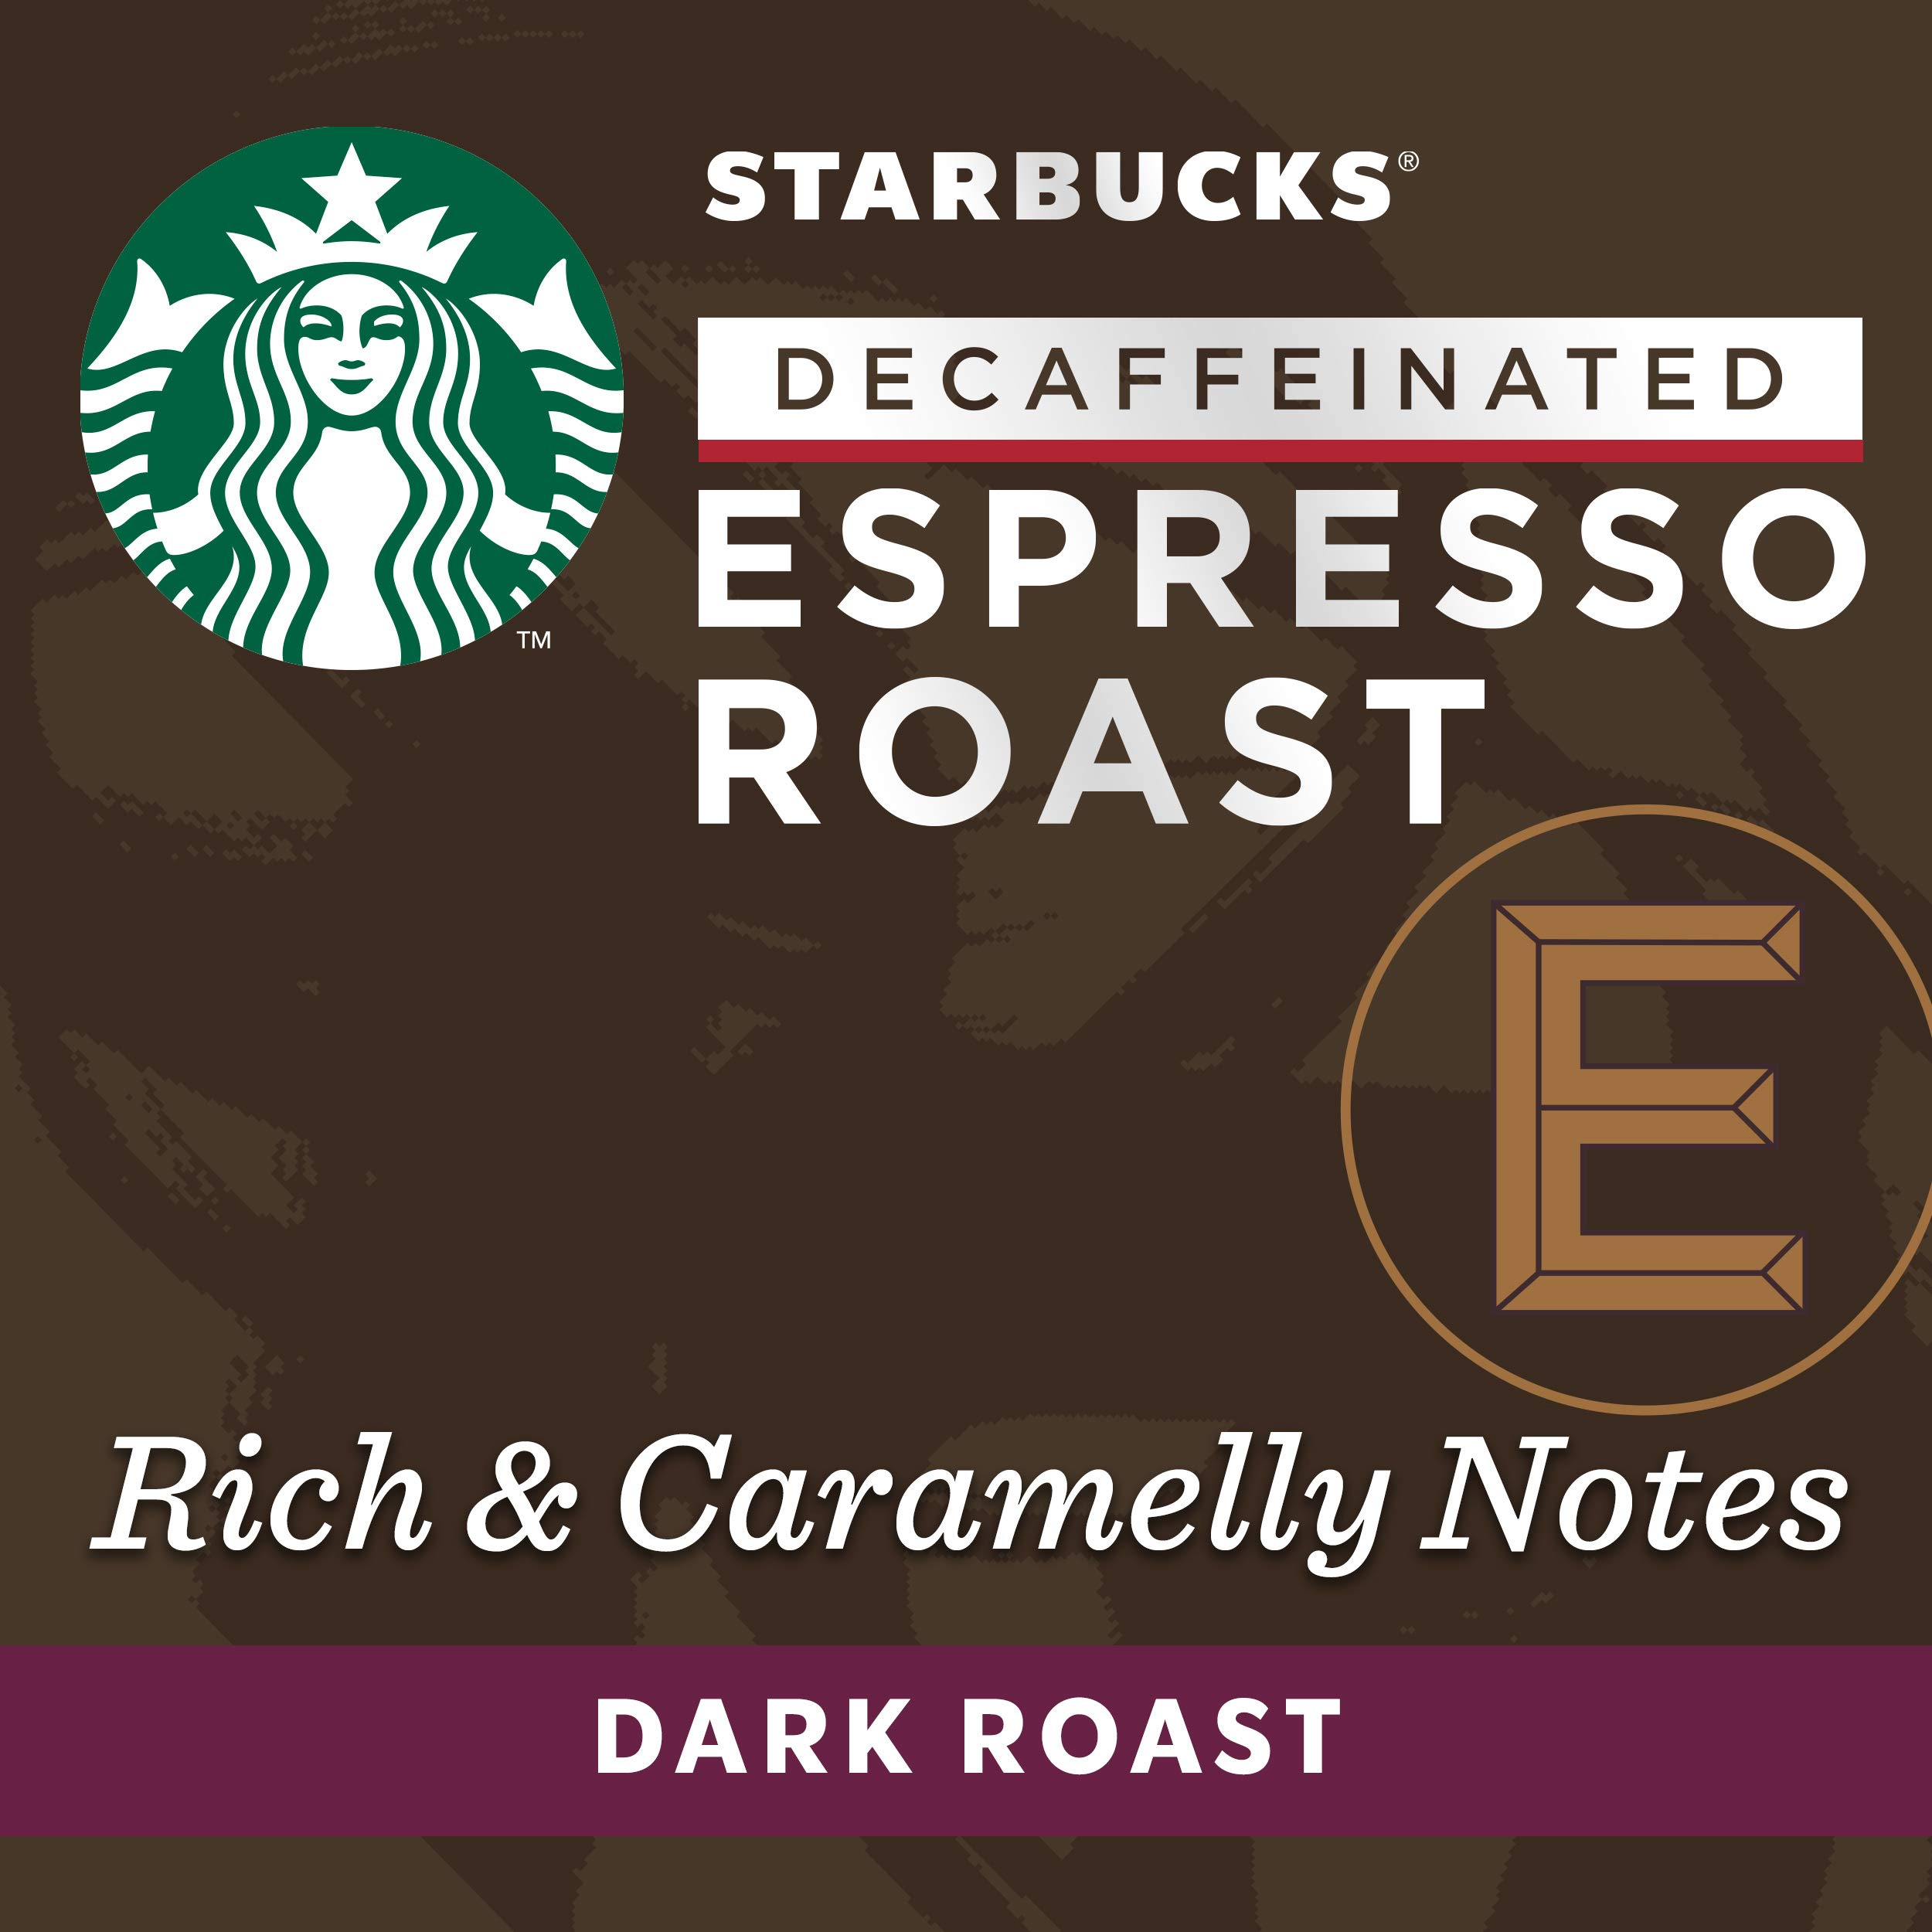 Starbucks by Nespresso, Decaf Espresso Dark Roast (50-count single serve capsules, compatible with Nespresso Original Line System) by Starbucks for Nespresso (Image #3)